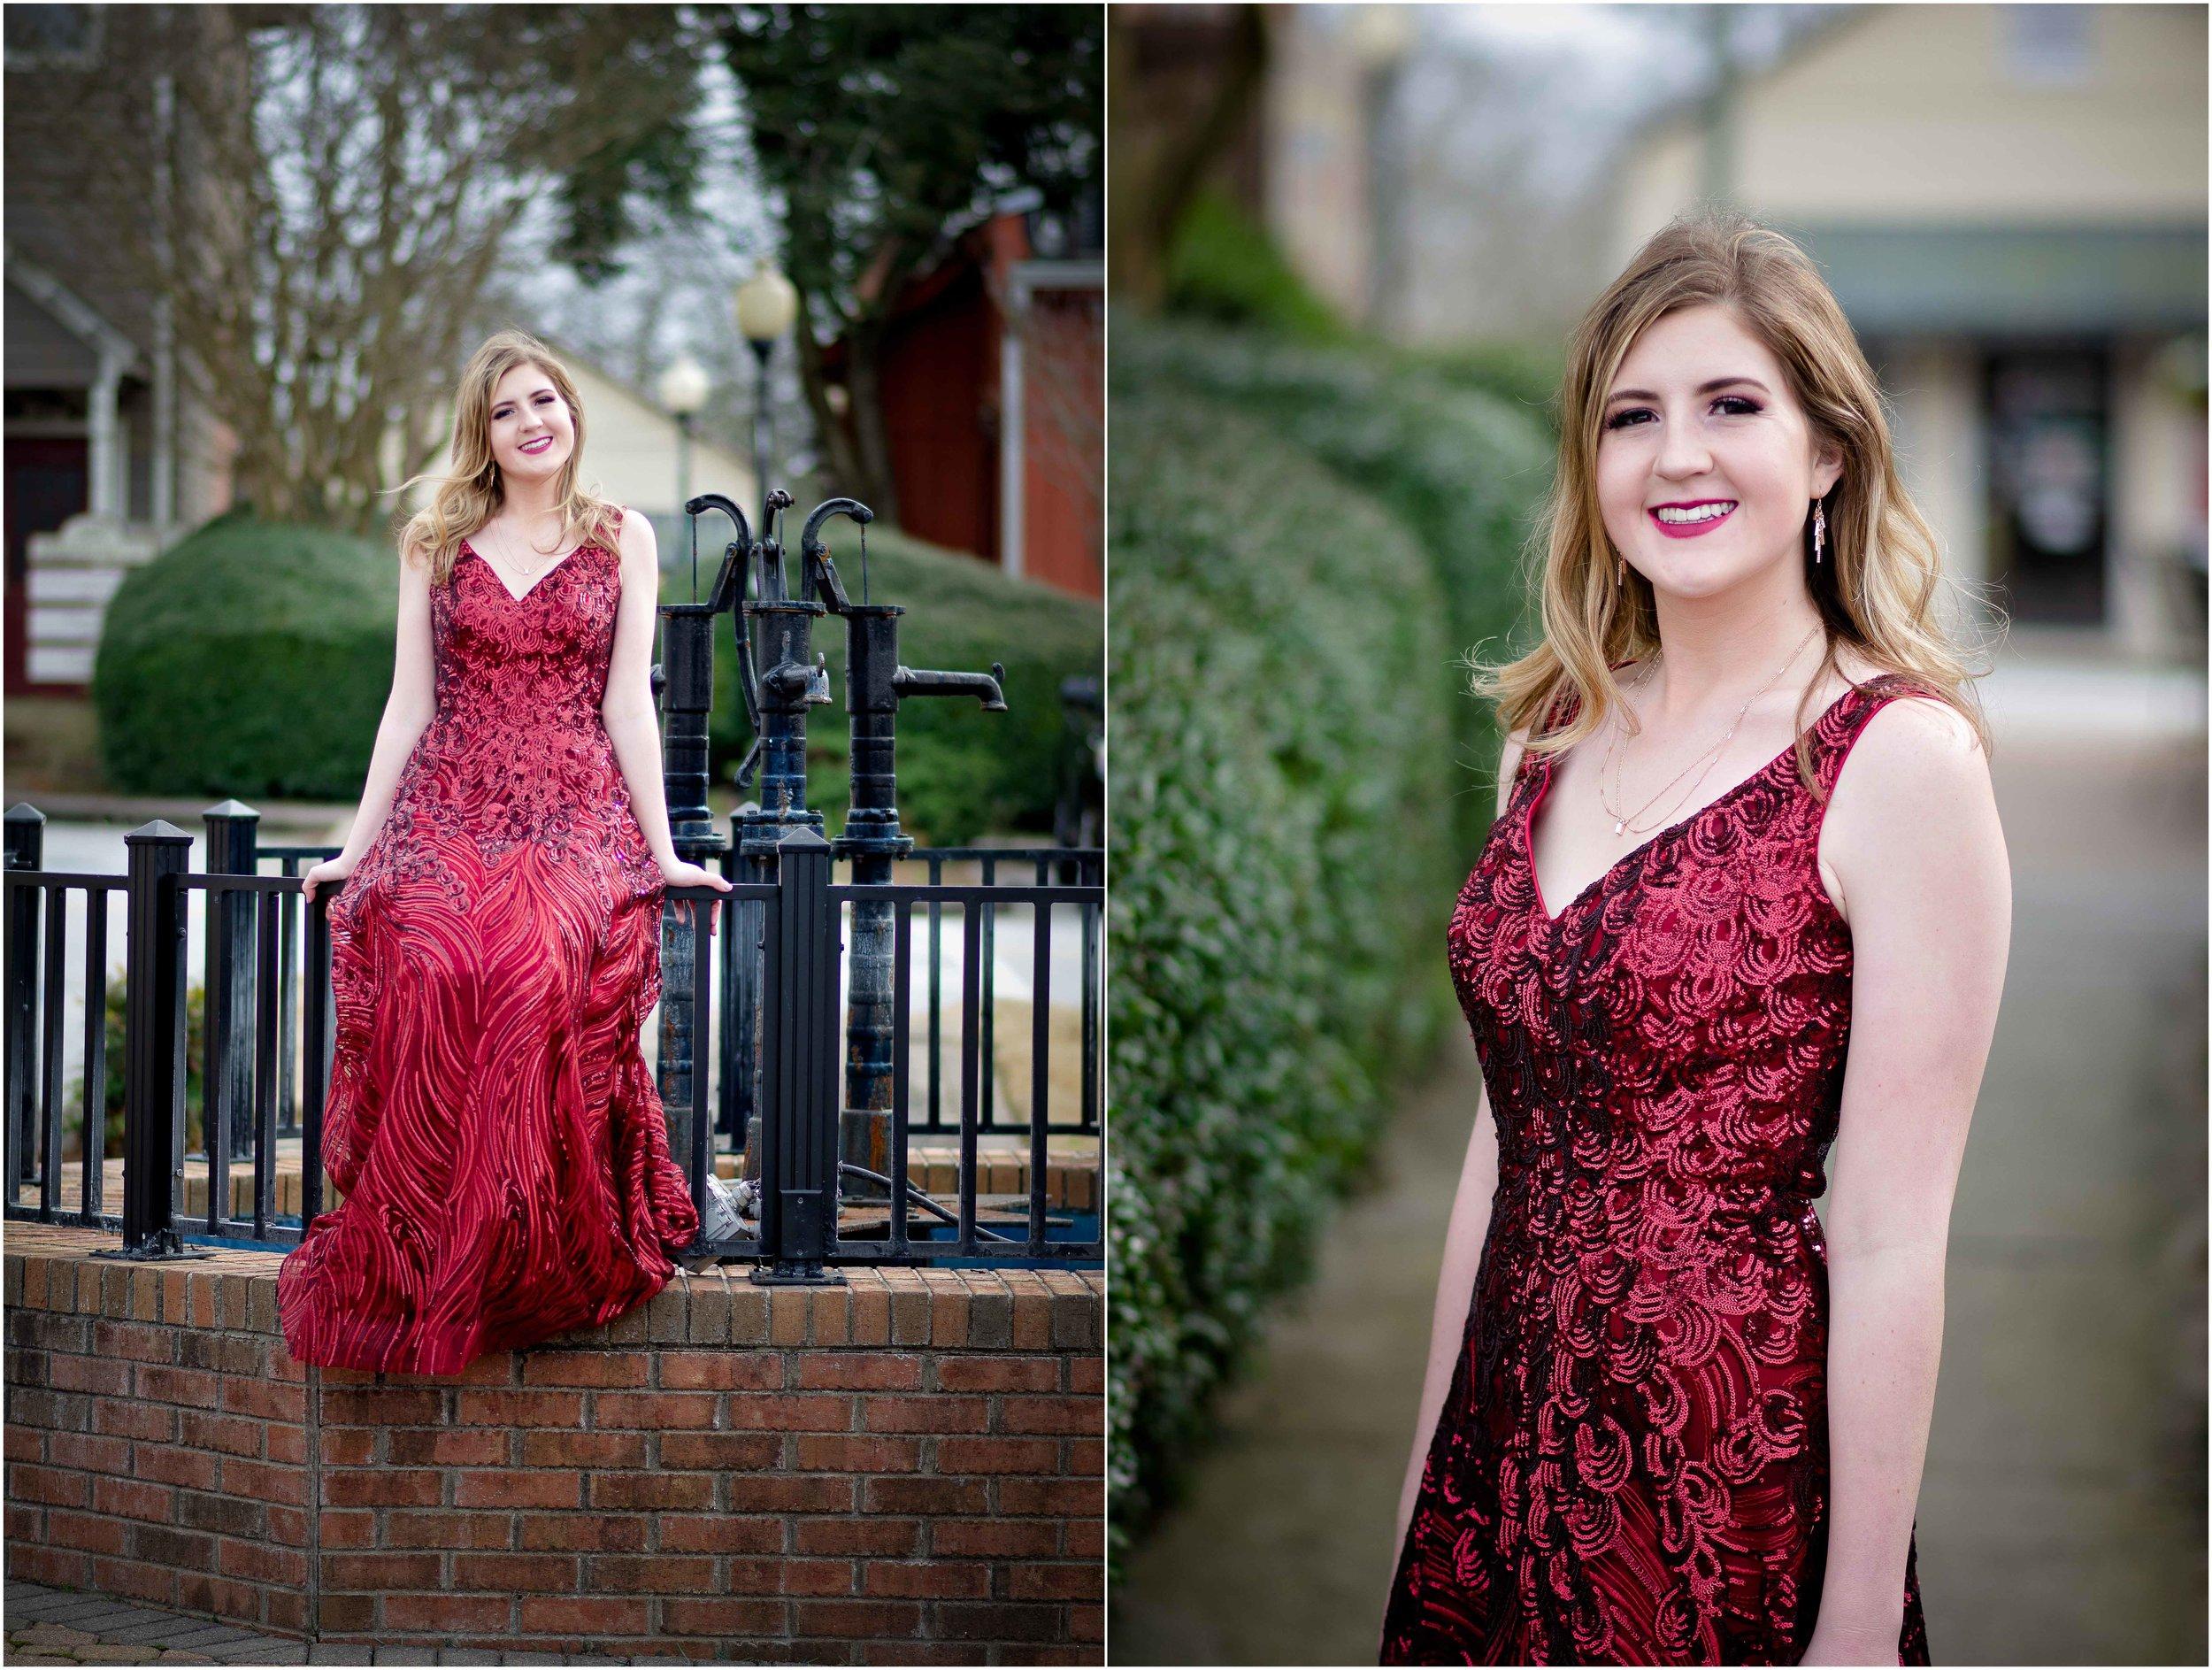 Hannah in her stunning red dress. McEachern High School Prom 2019